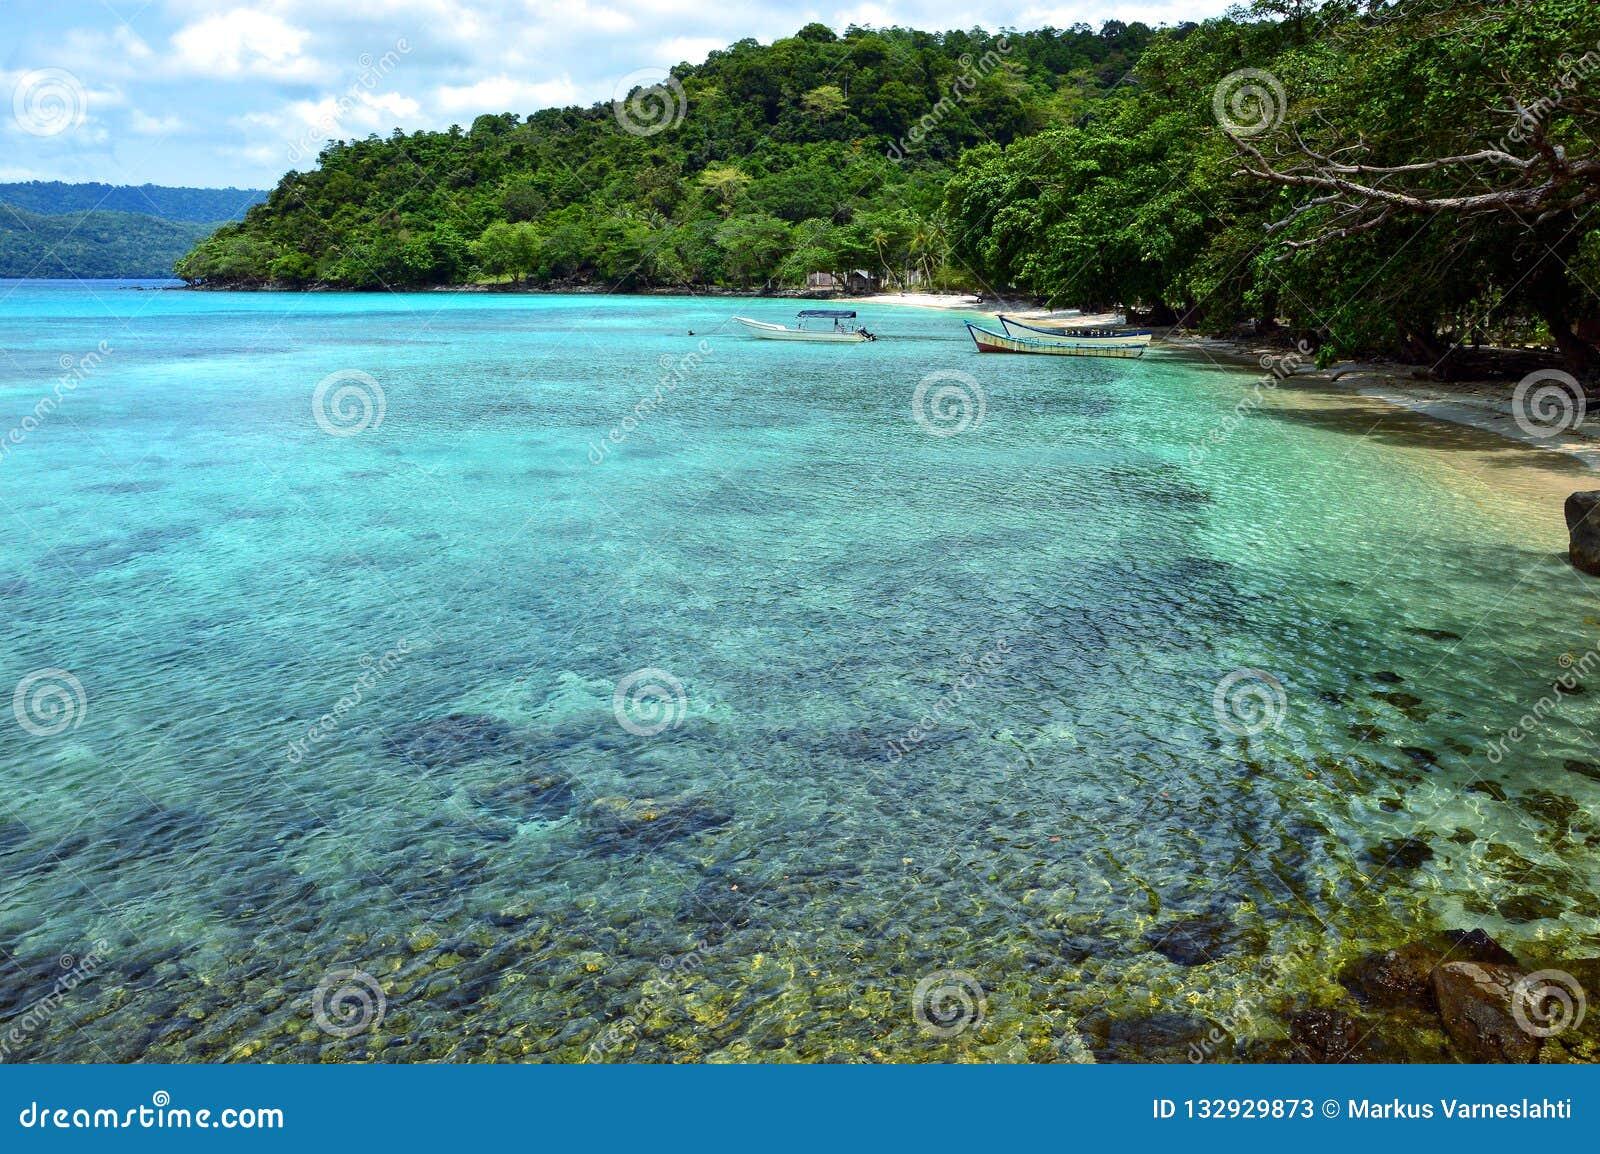 Paradise beach in Pulau Weh, Indonesia.